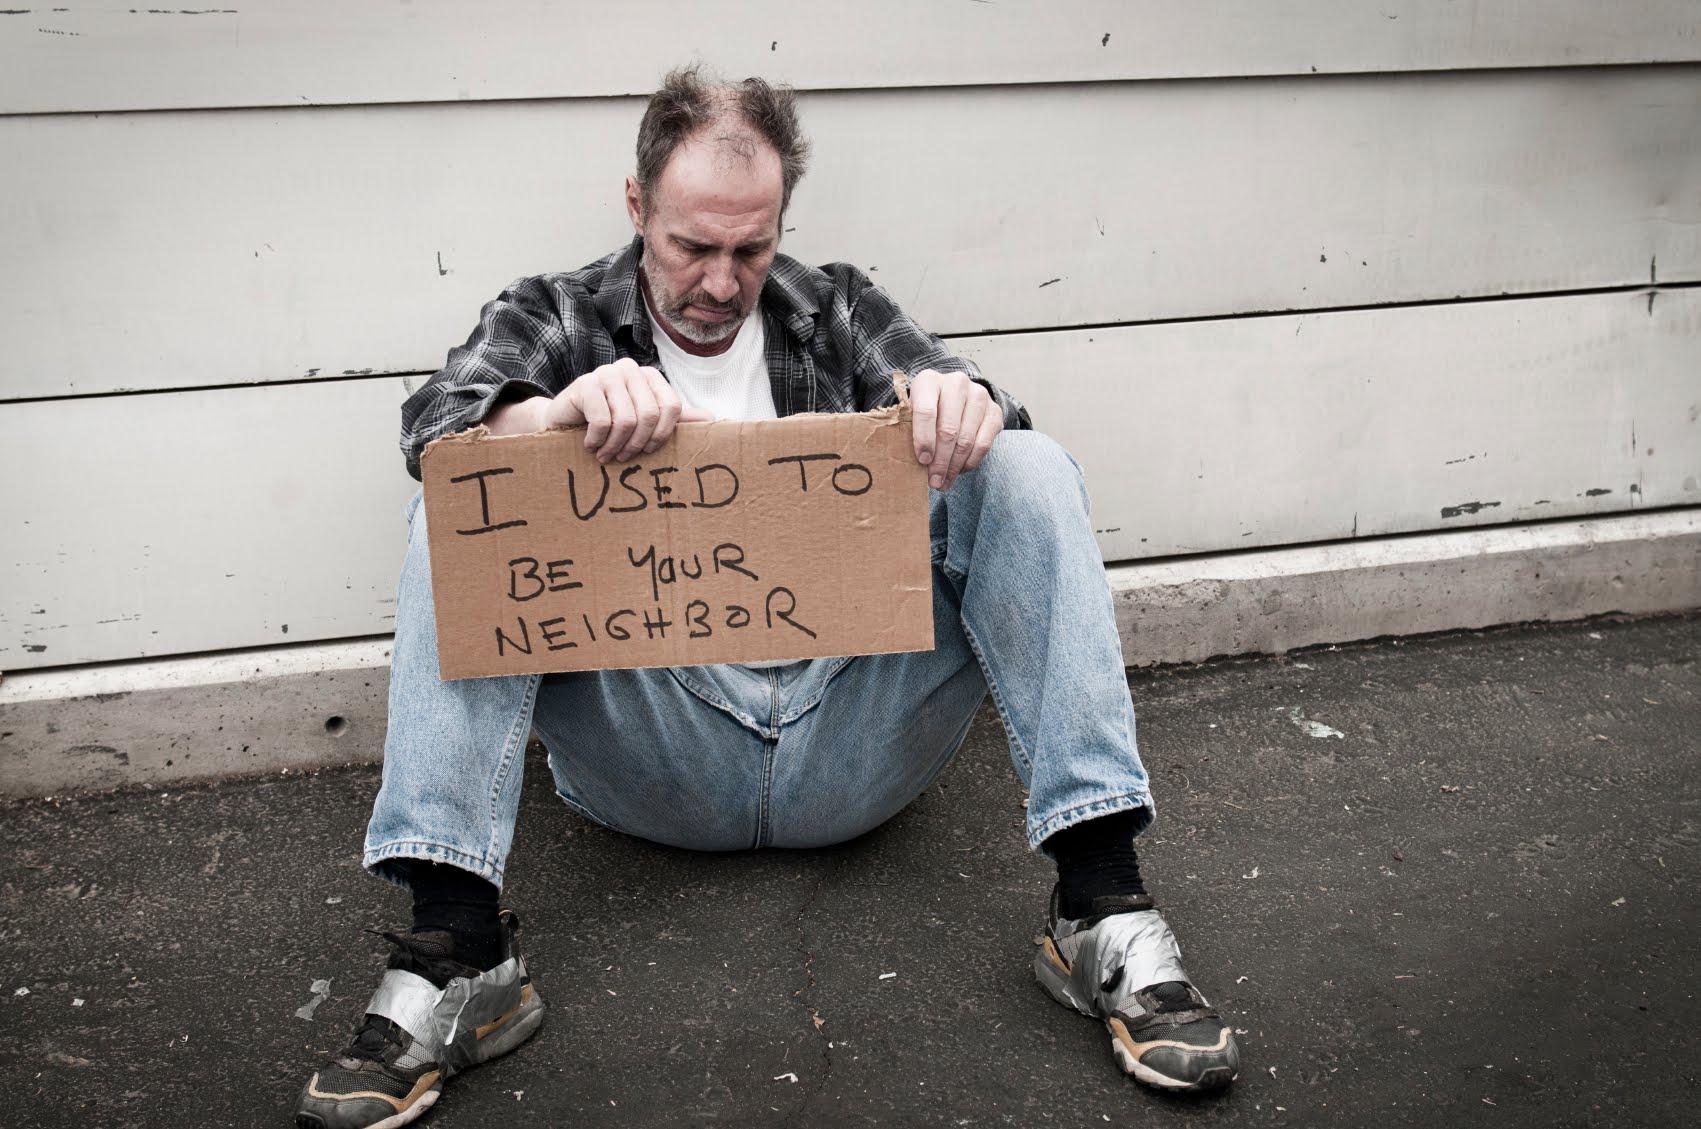 C4AC - Web design - Homeless stock image.jpg